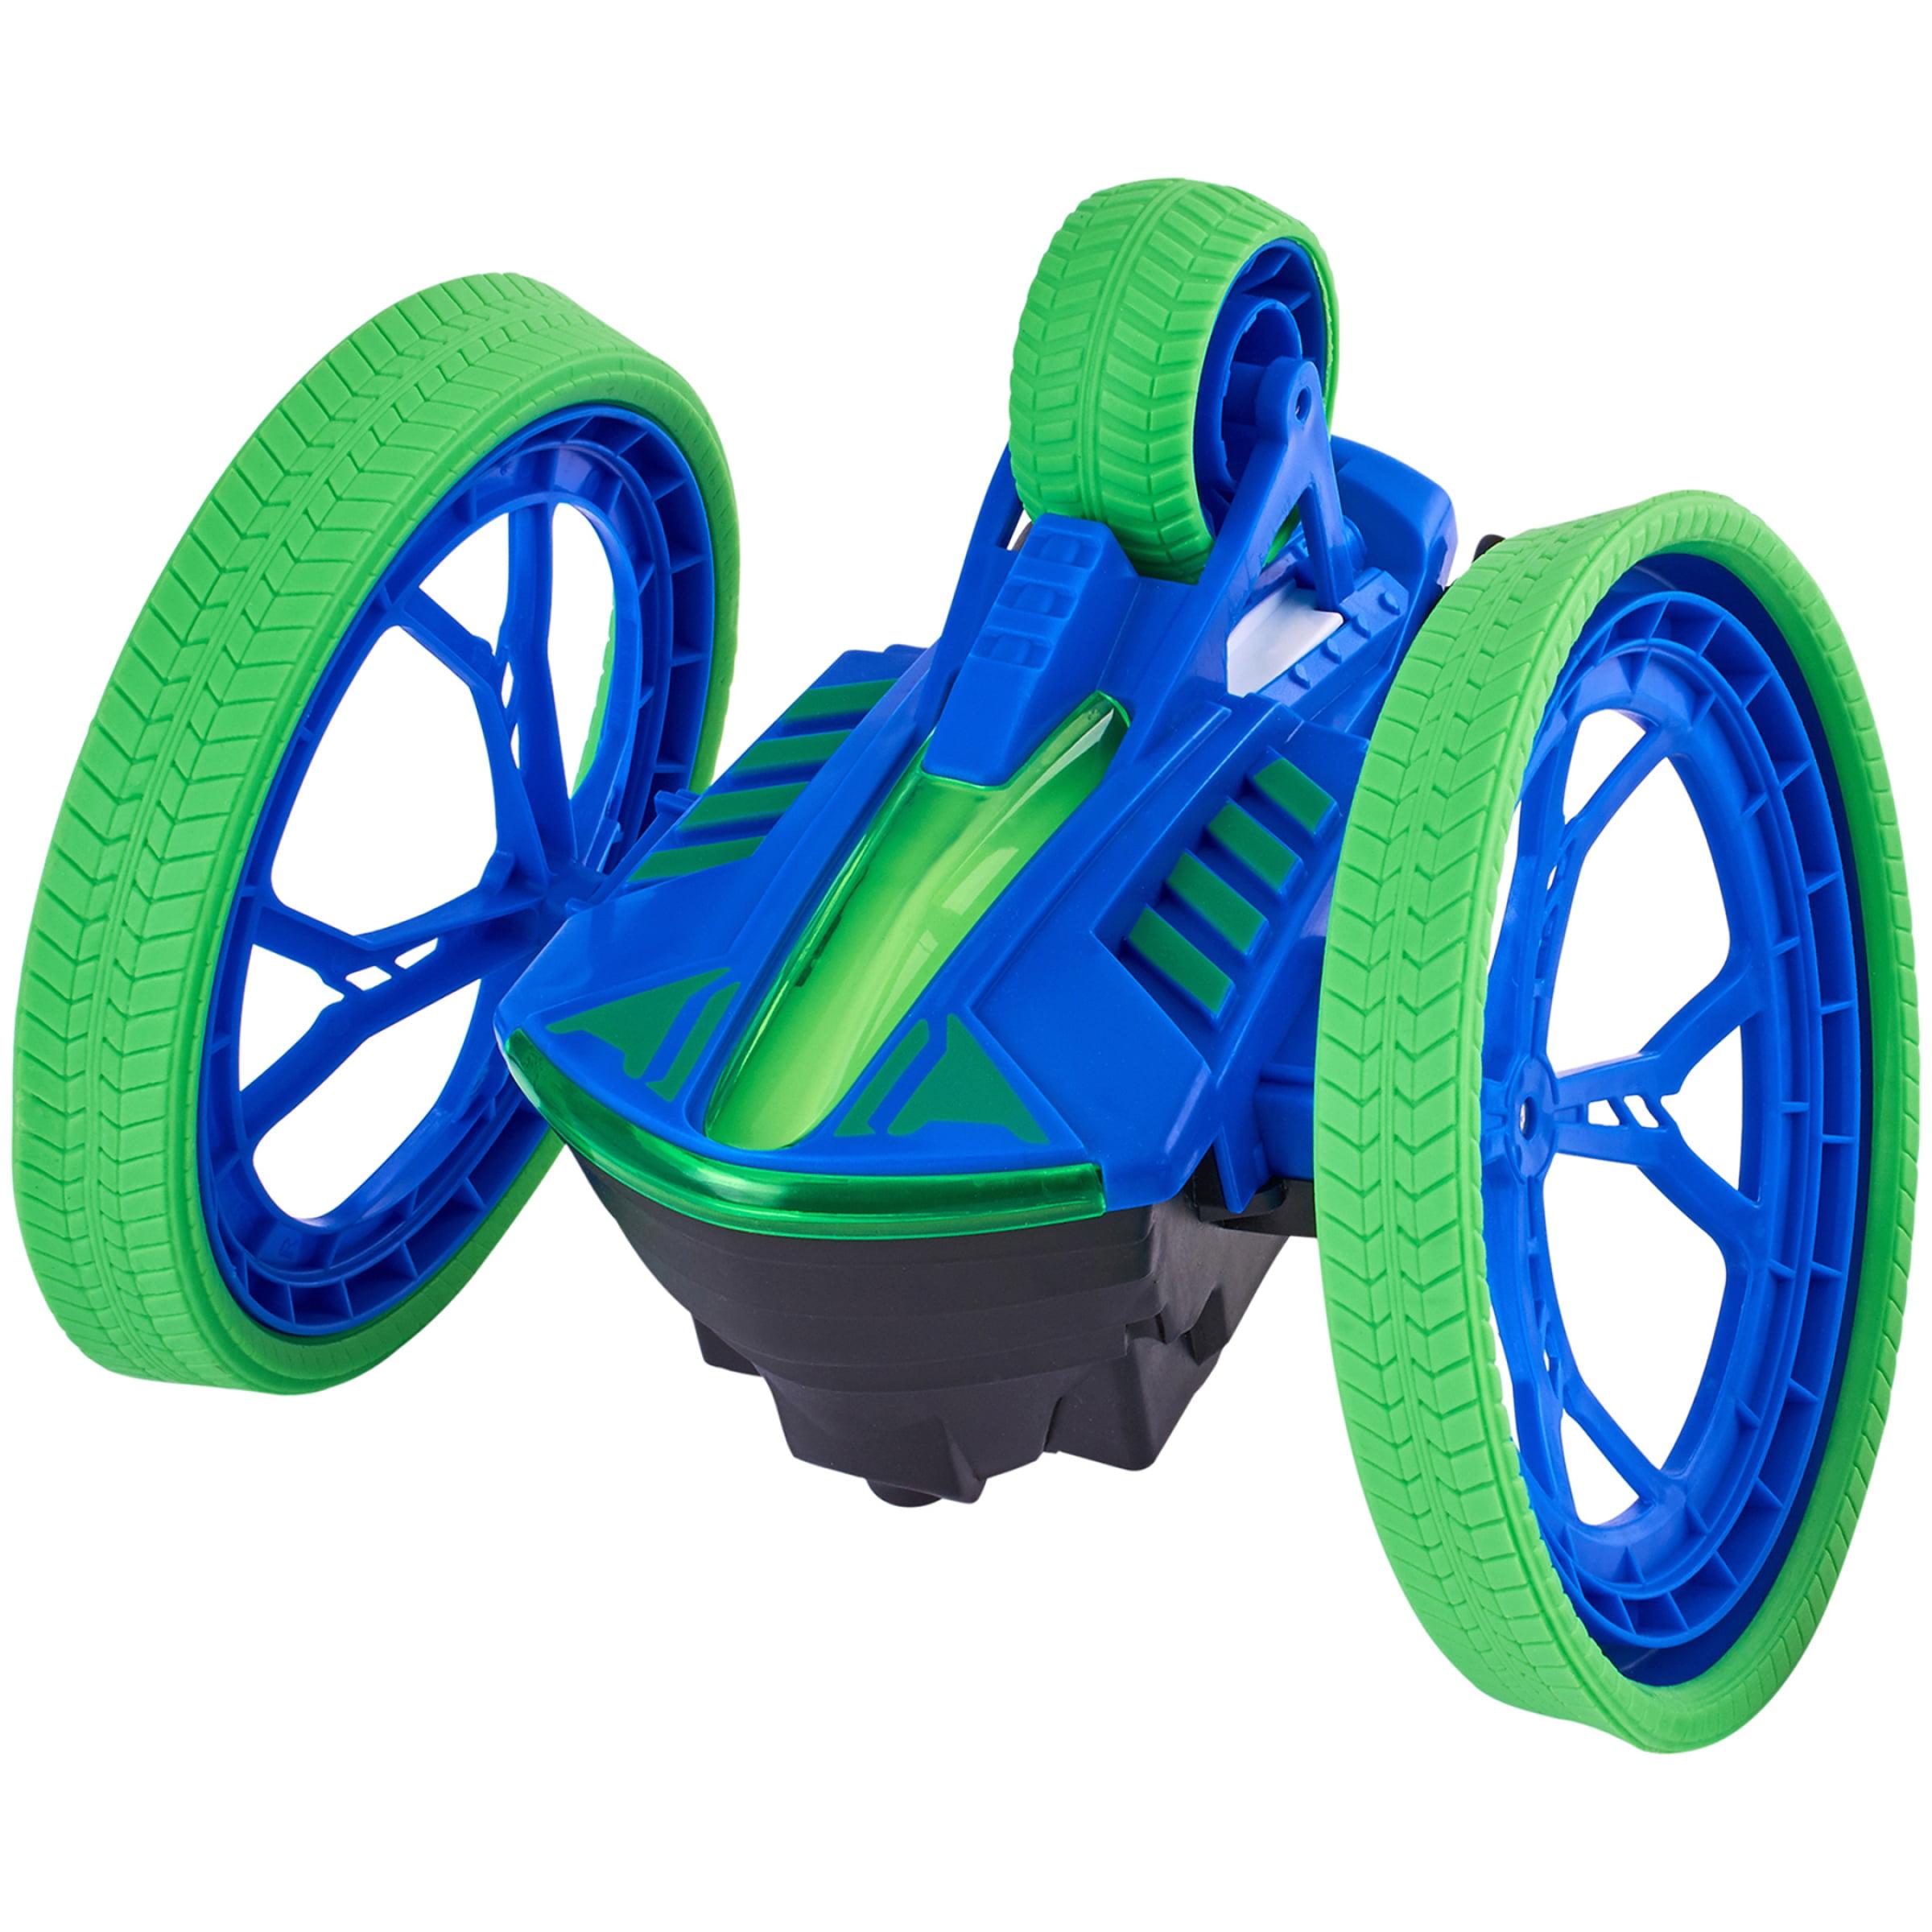 Adventure Force Max Rumbler Radio Controlled Stunt Vehicle, Blue & Green